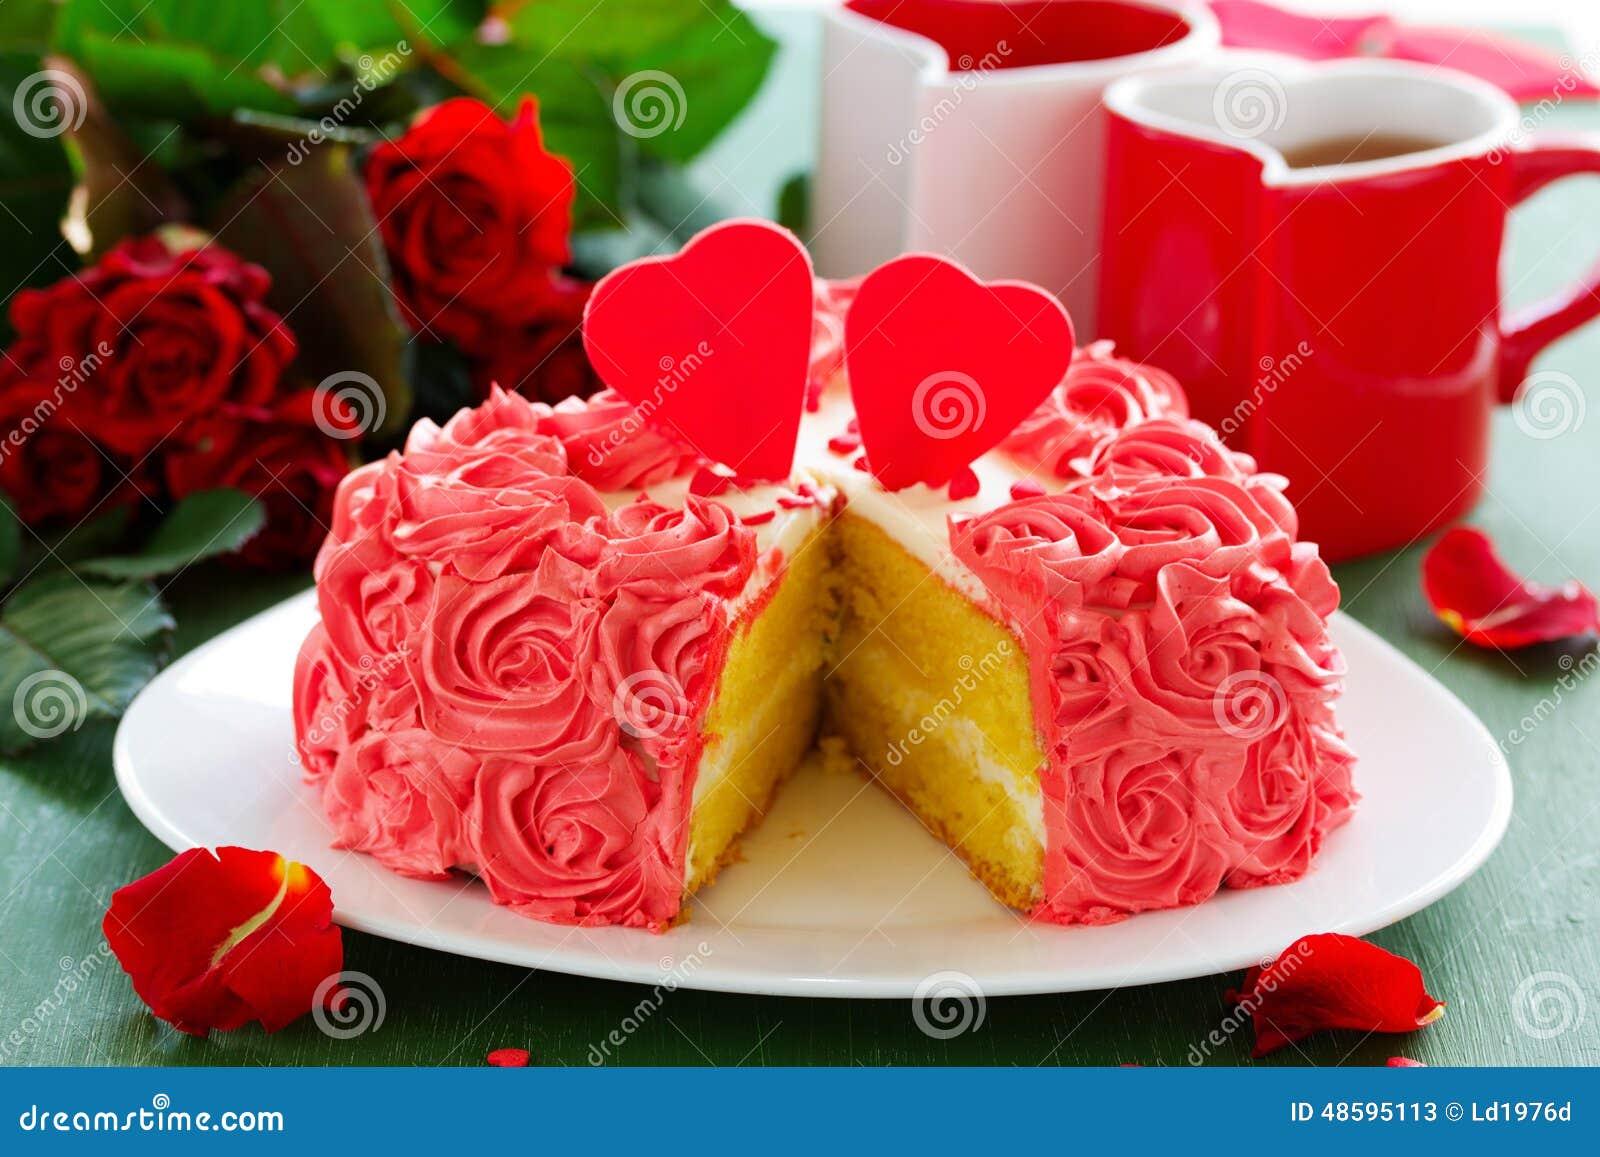 Birthday Cake For Valentines Day Stock Image Image Of Spray Love